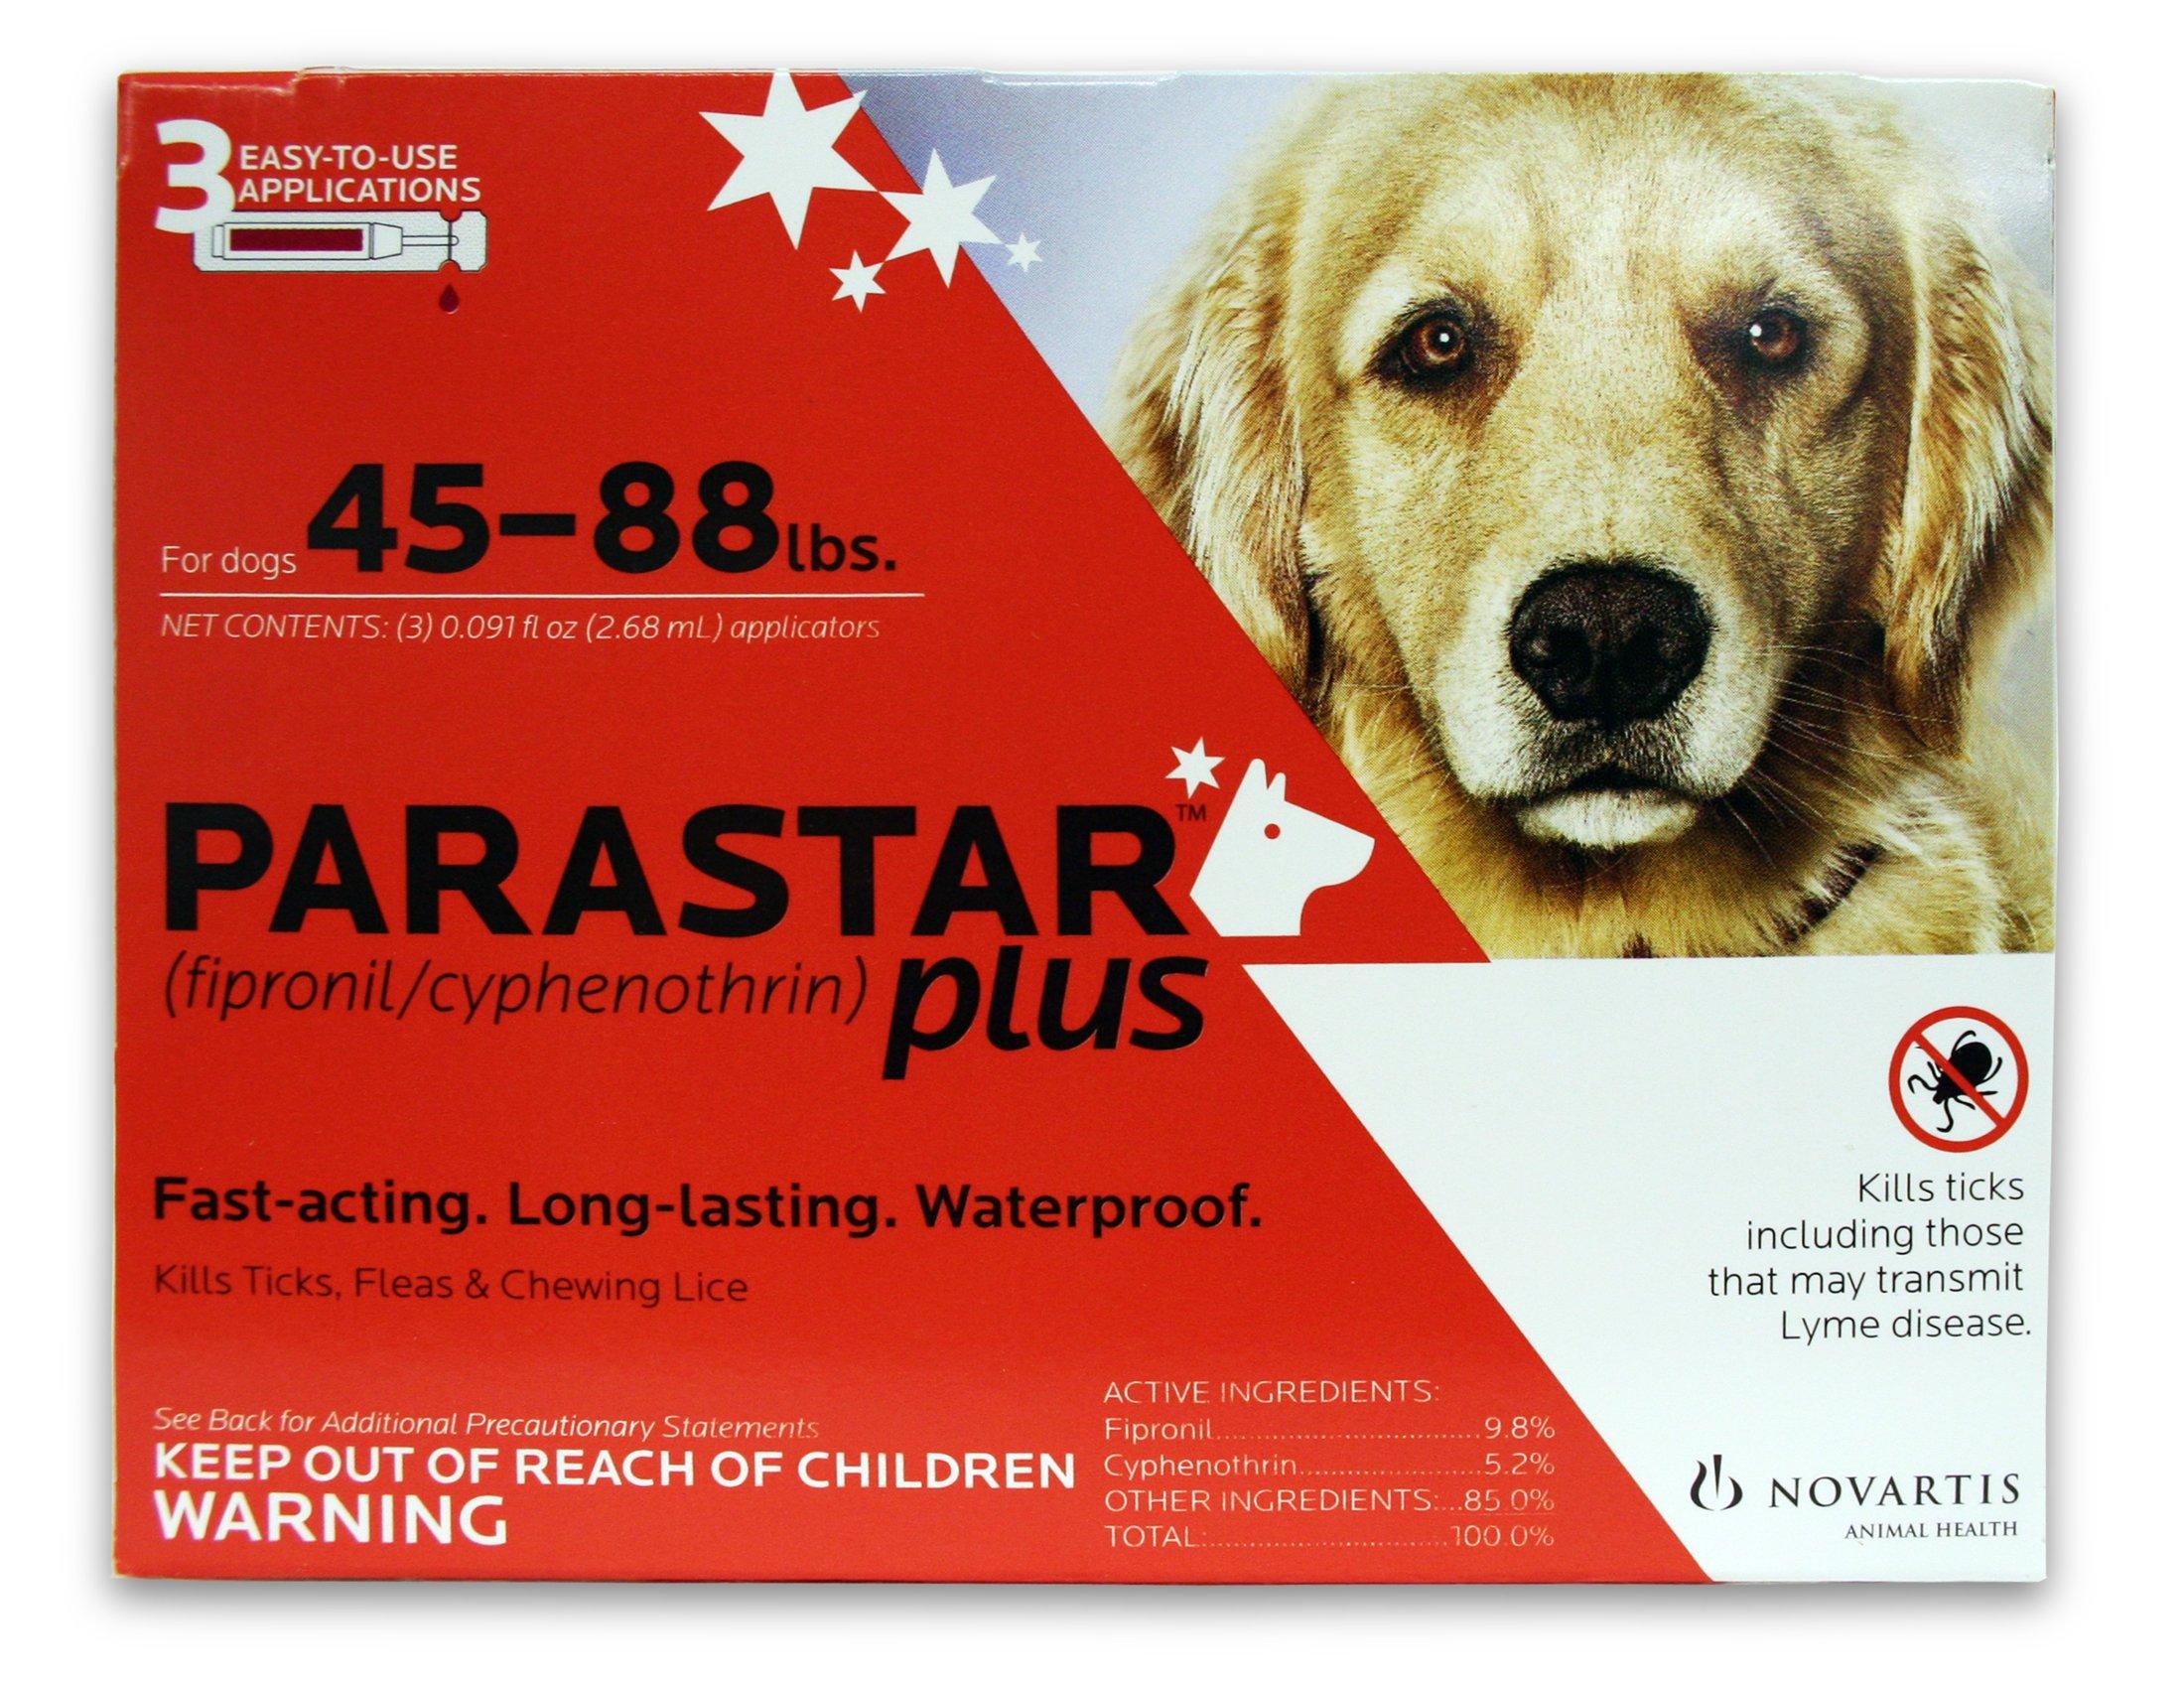 Novartis Parastar Plus Flea and Tick Control for Dogs, 45 to 88-Pound, Red by Parastar